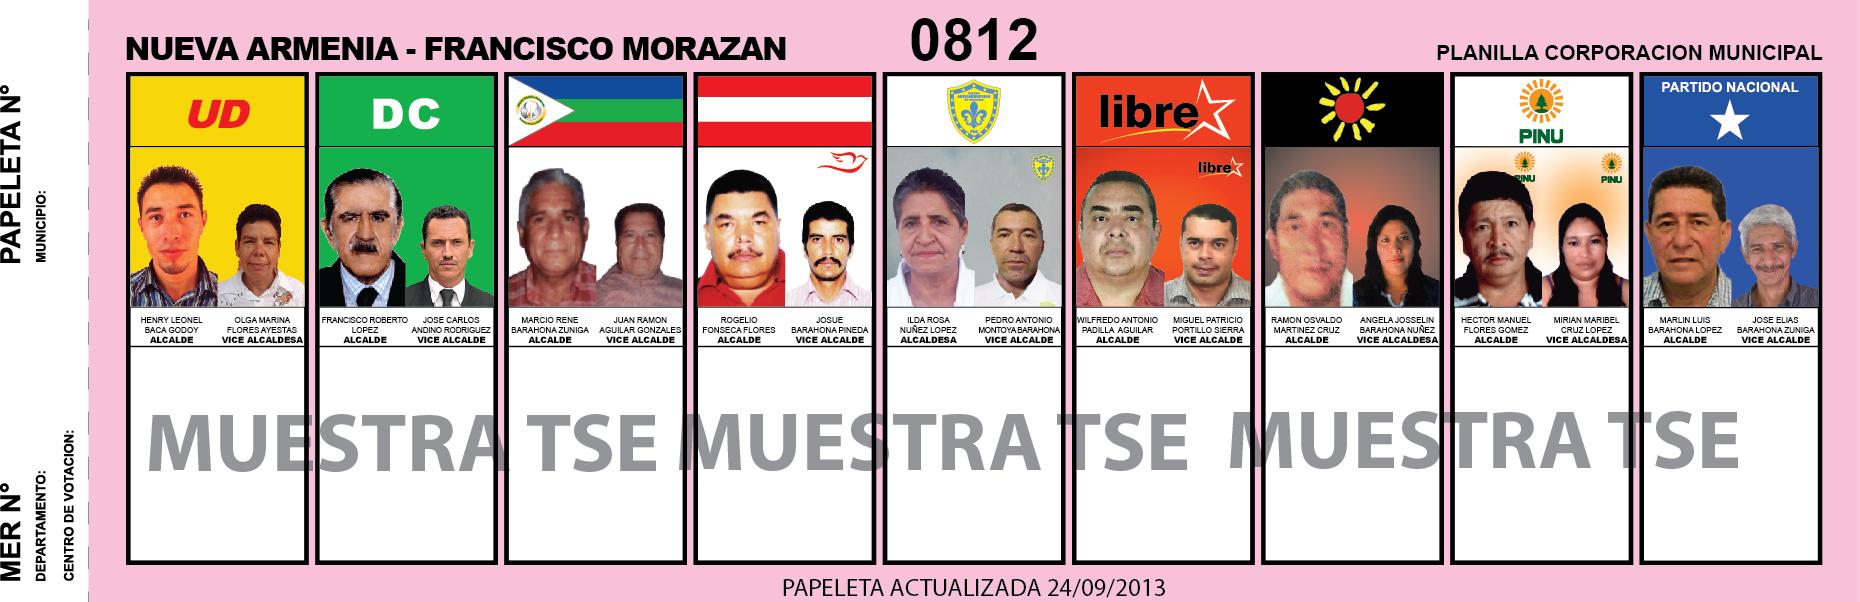 CANDIDATOS 2013 MUNICIPIO NUEVA ARMENIA - FRANCISCO MORAZAN - HONDURAS